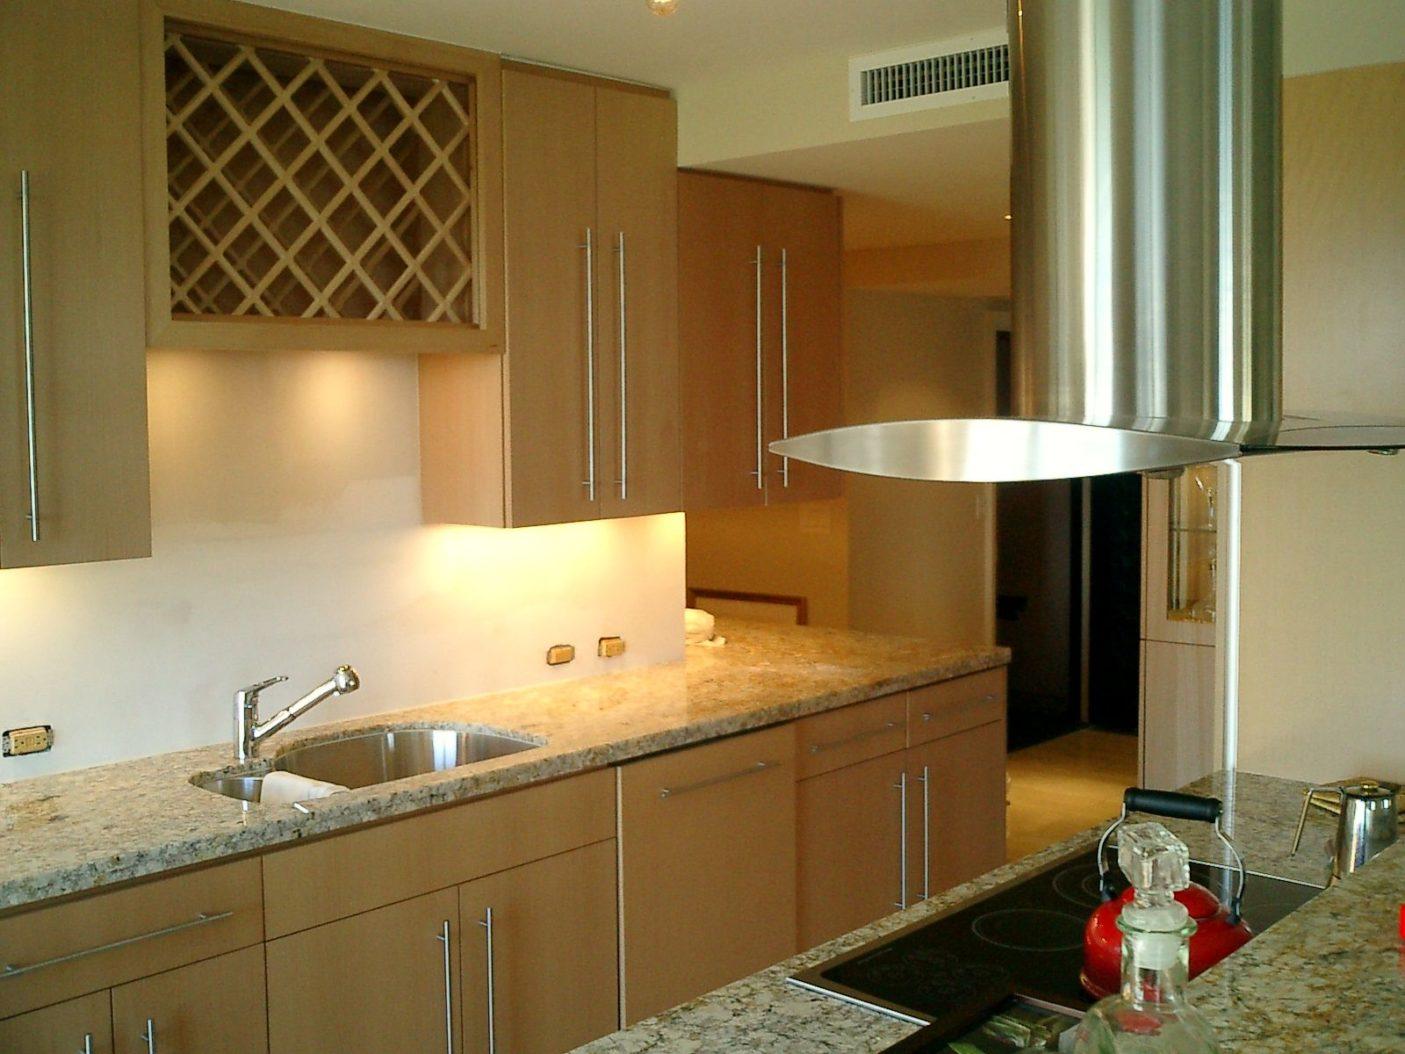 Kitchens-14.jpg